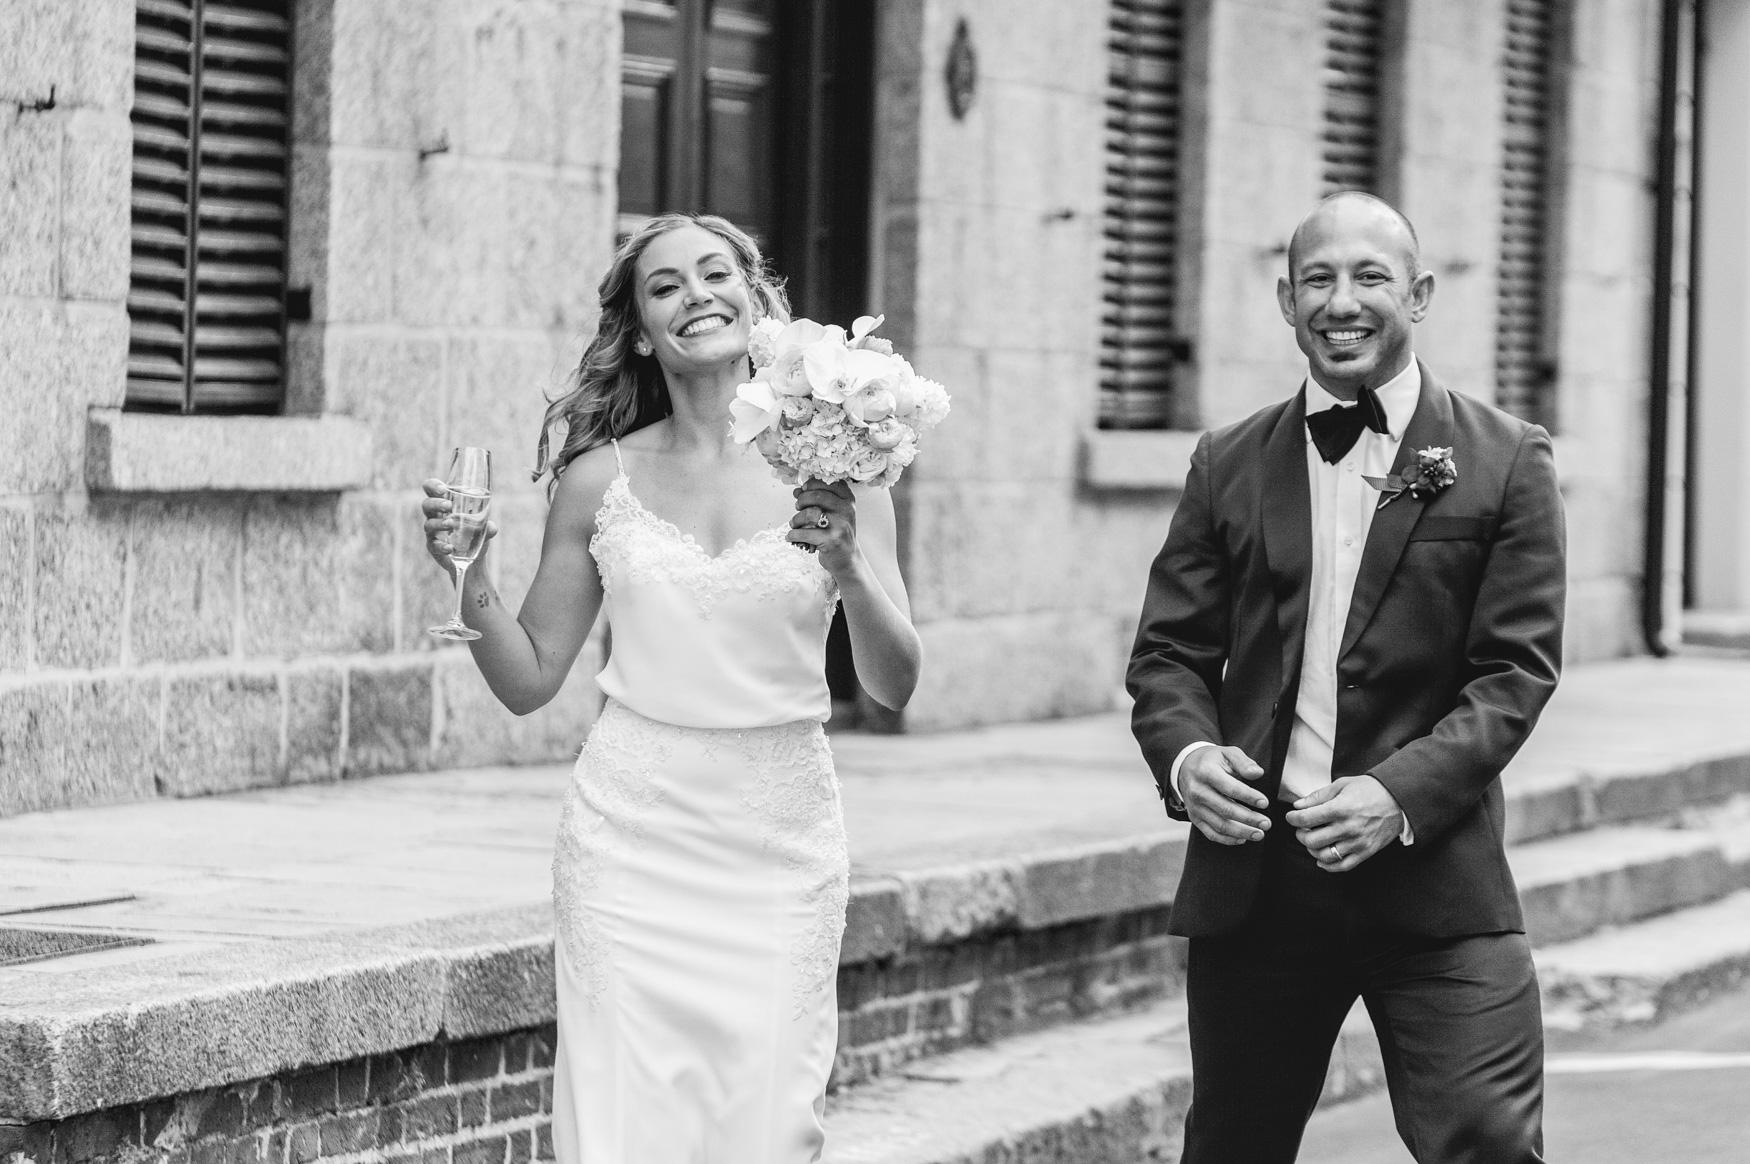 john-henry-wedding-photographer-mike-louise-001-14.jpg